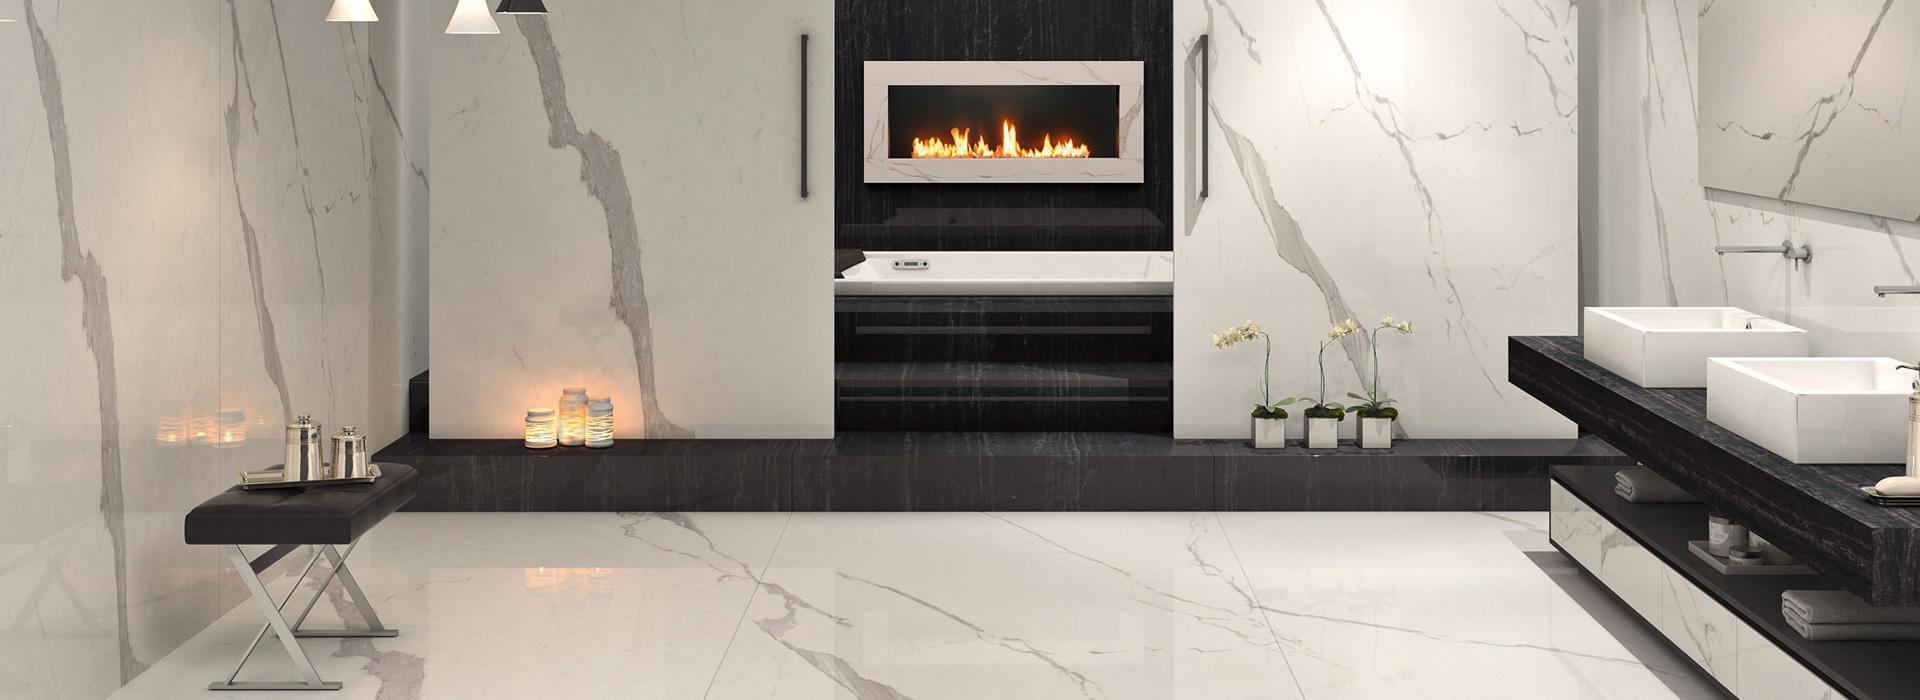 Marble Effectfloors And Walls